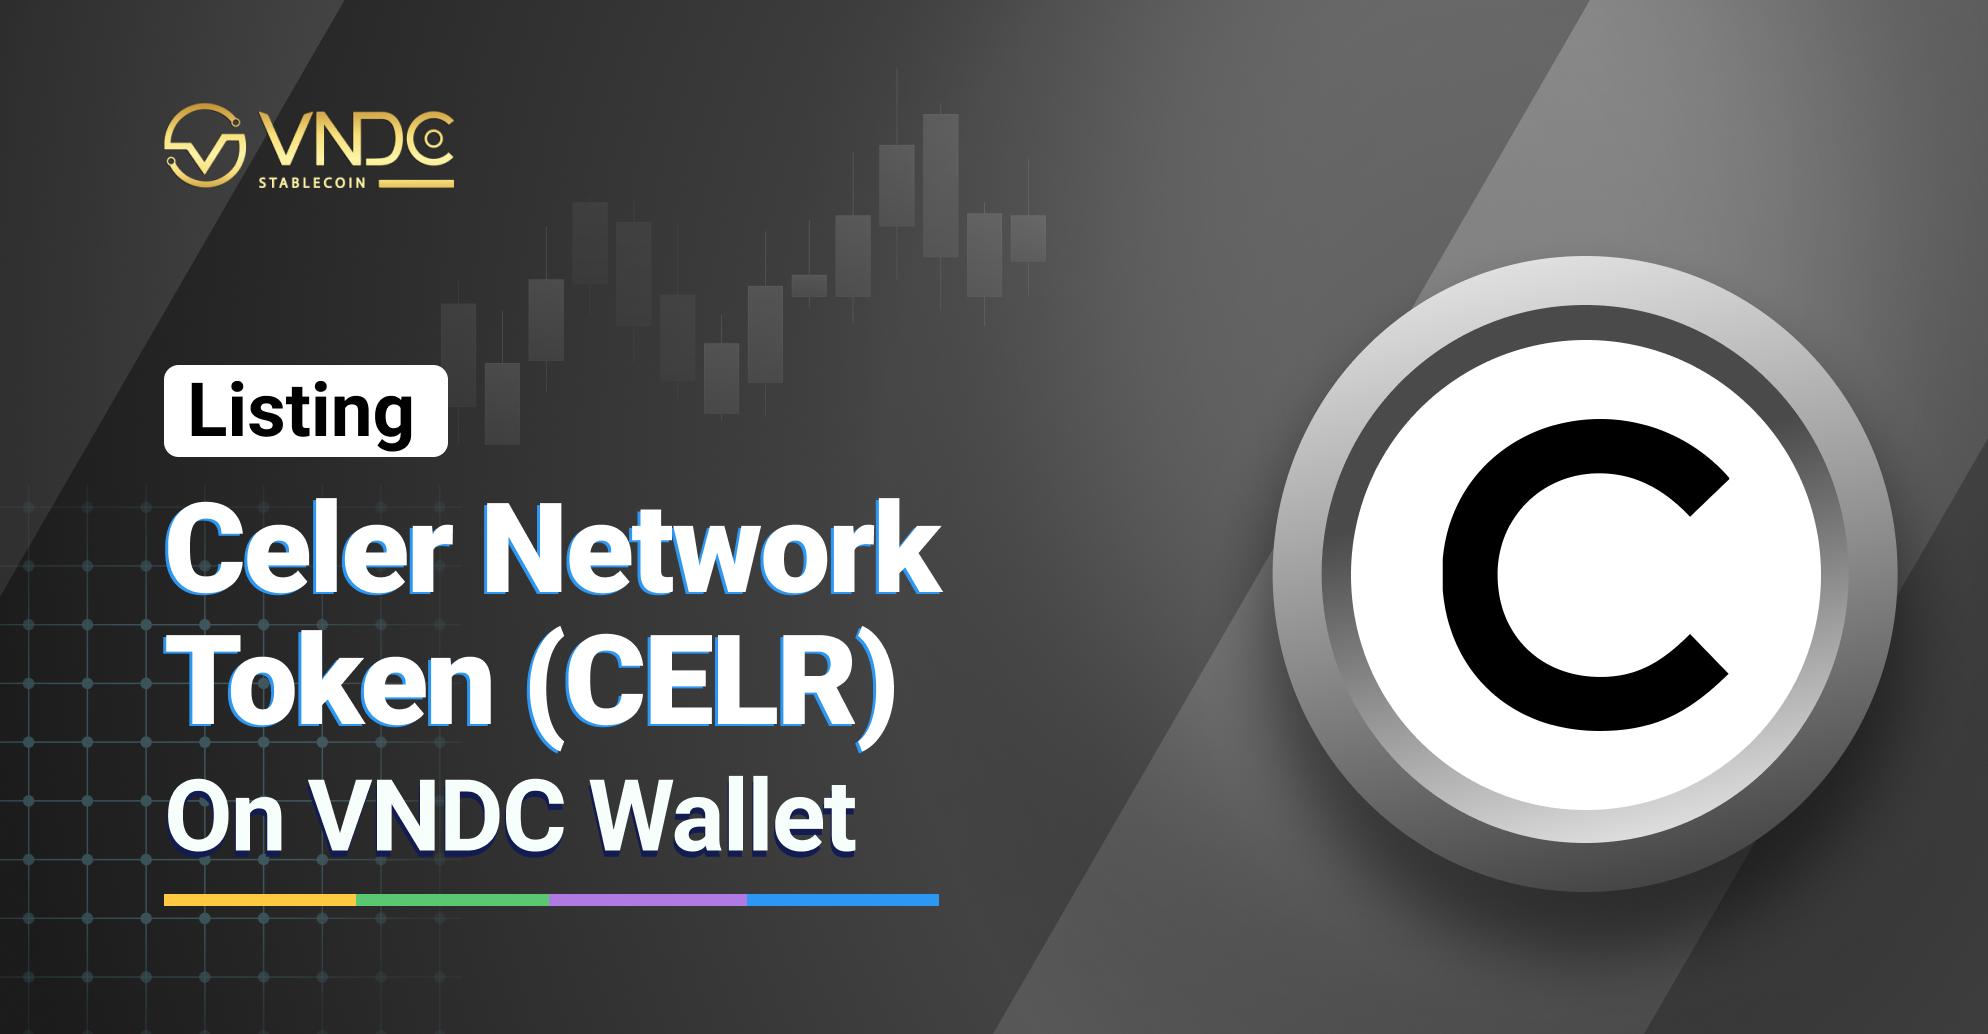 Listing Celer Network Token (CELR) on VNDC Wallet